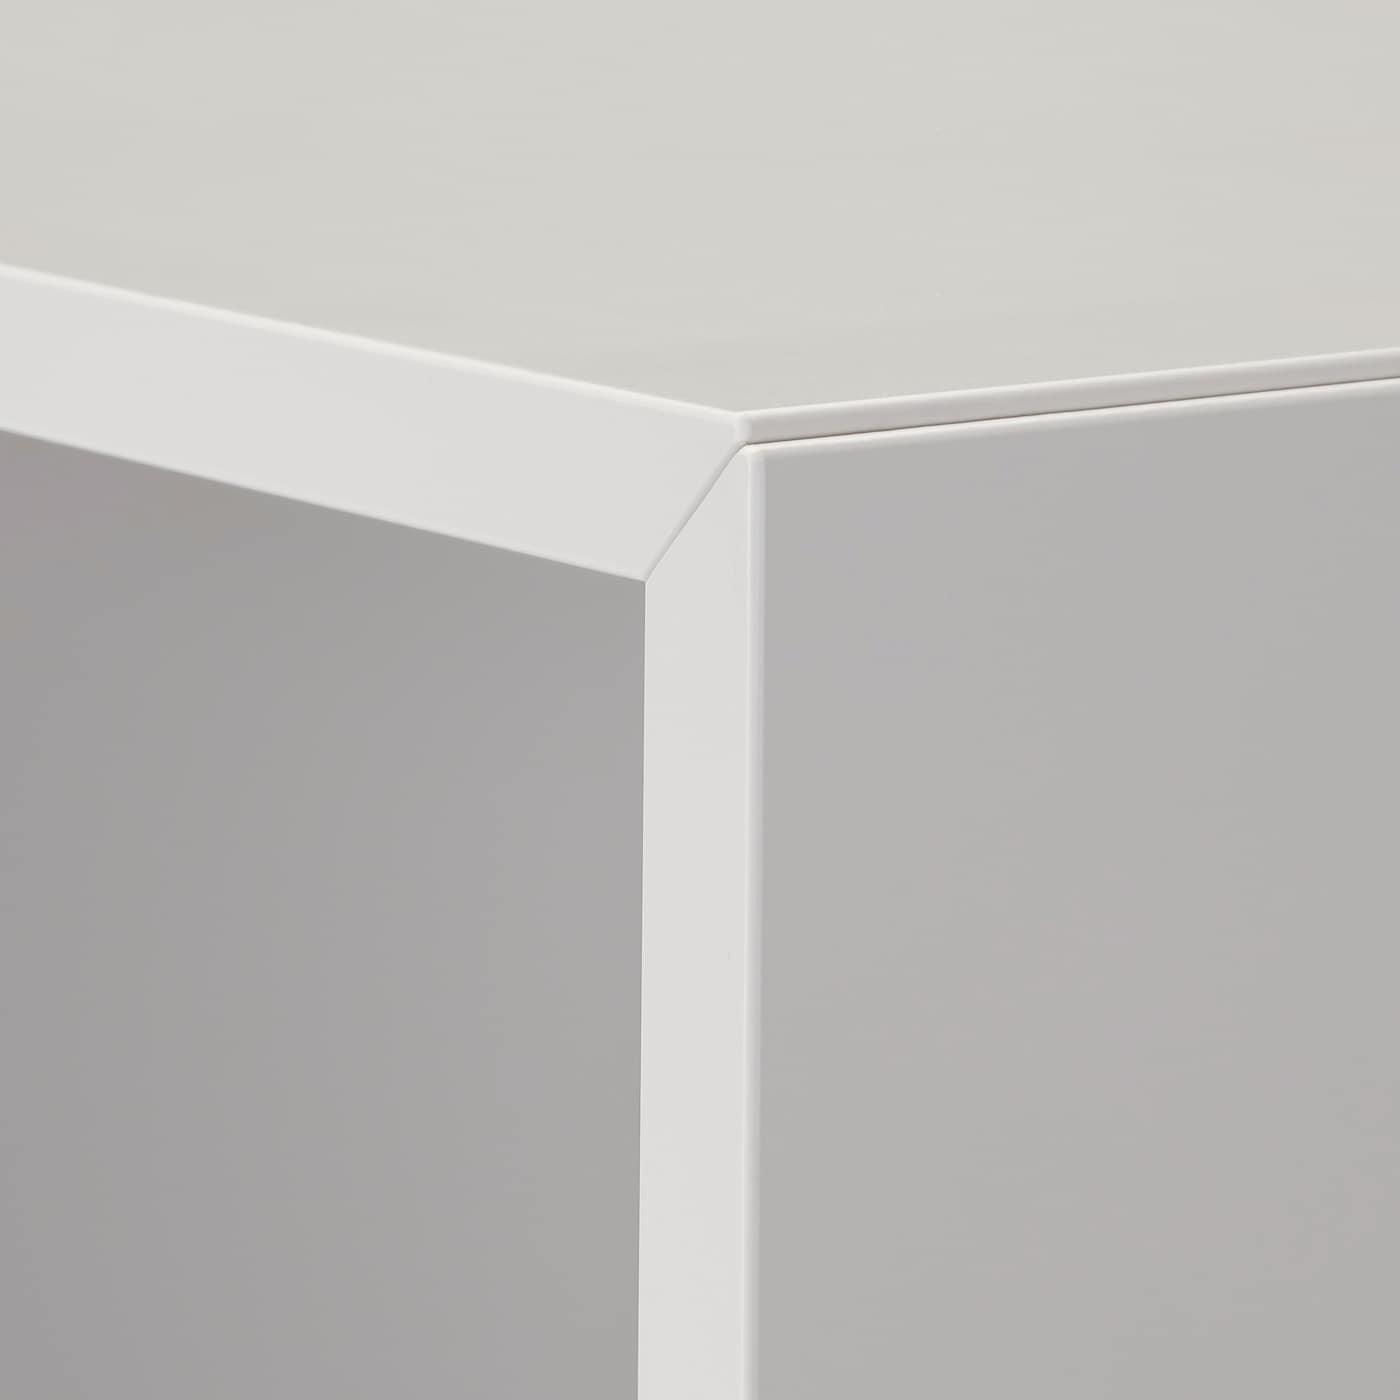 "EKET Storage combination with feet, white/gray, 27 1/2x9 7/8x28 3/8 """